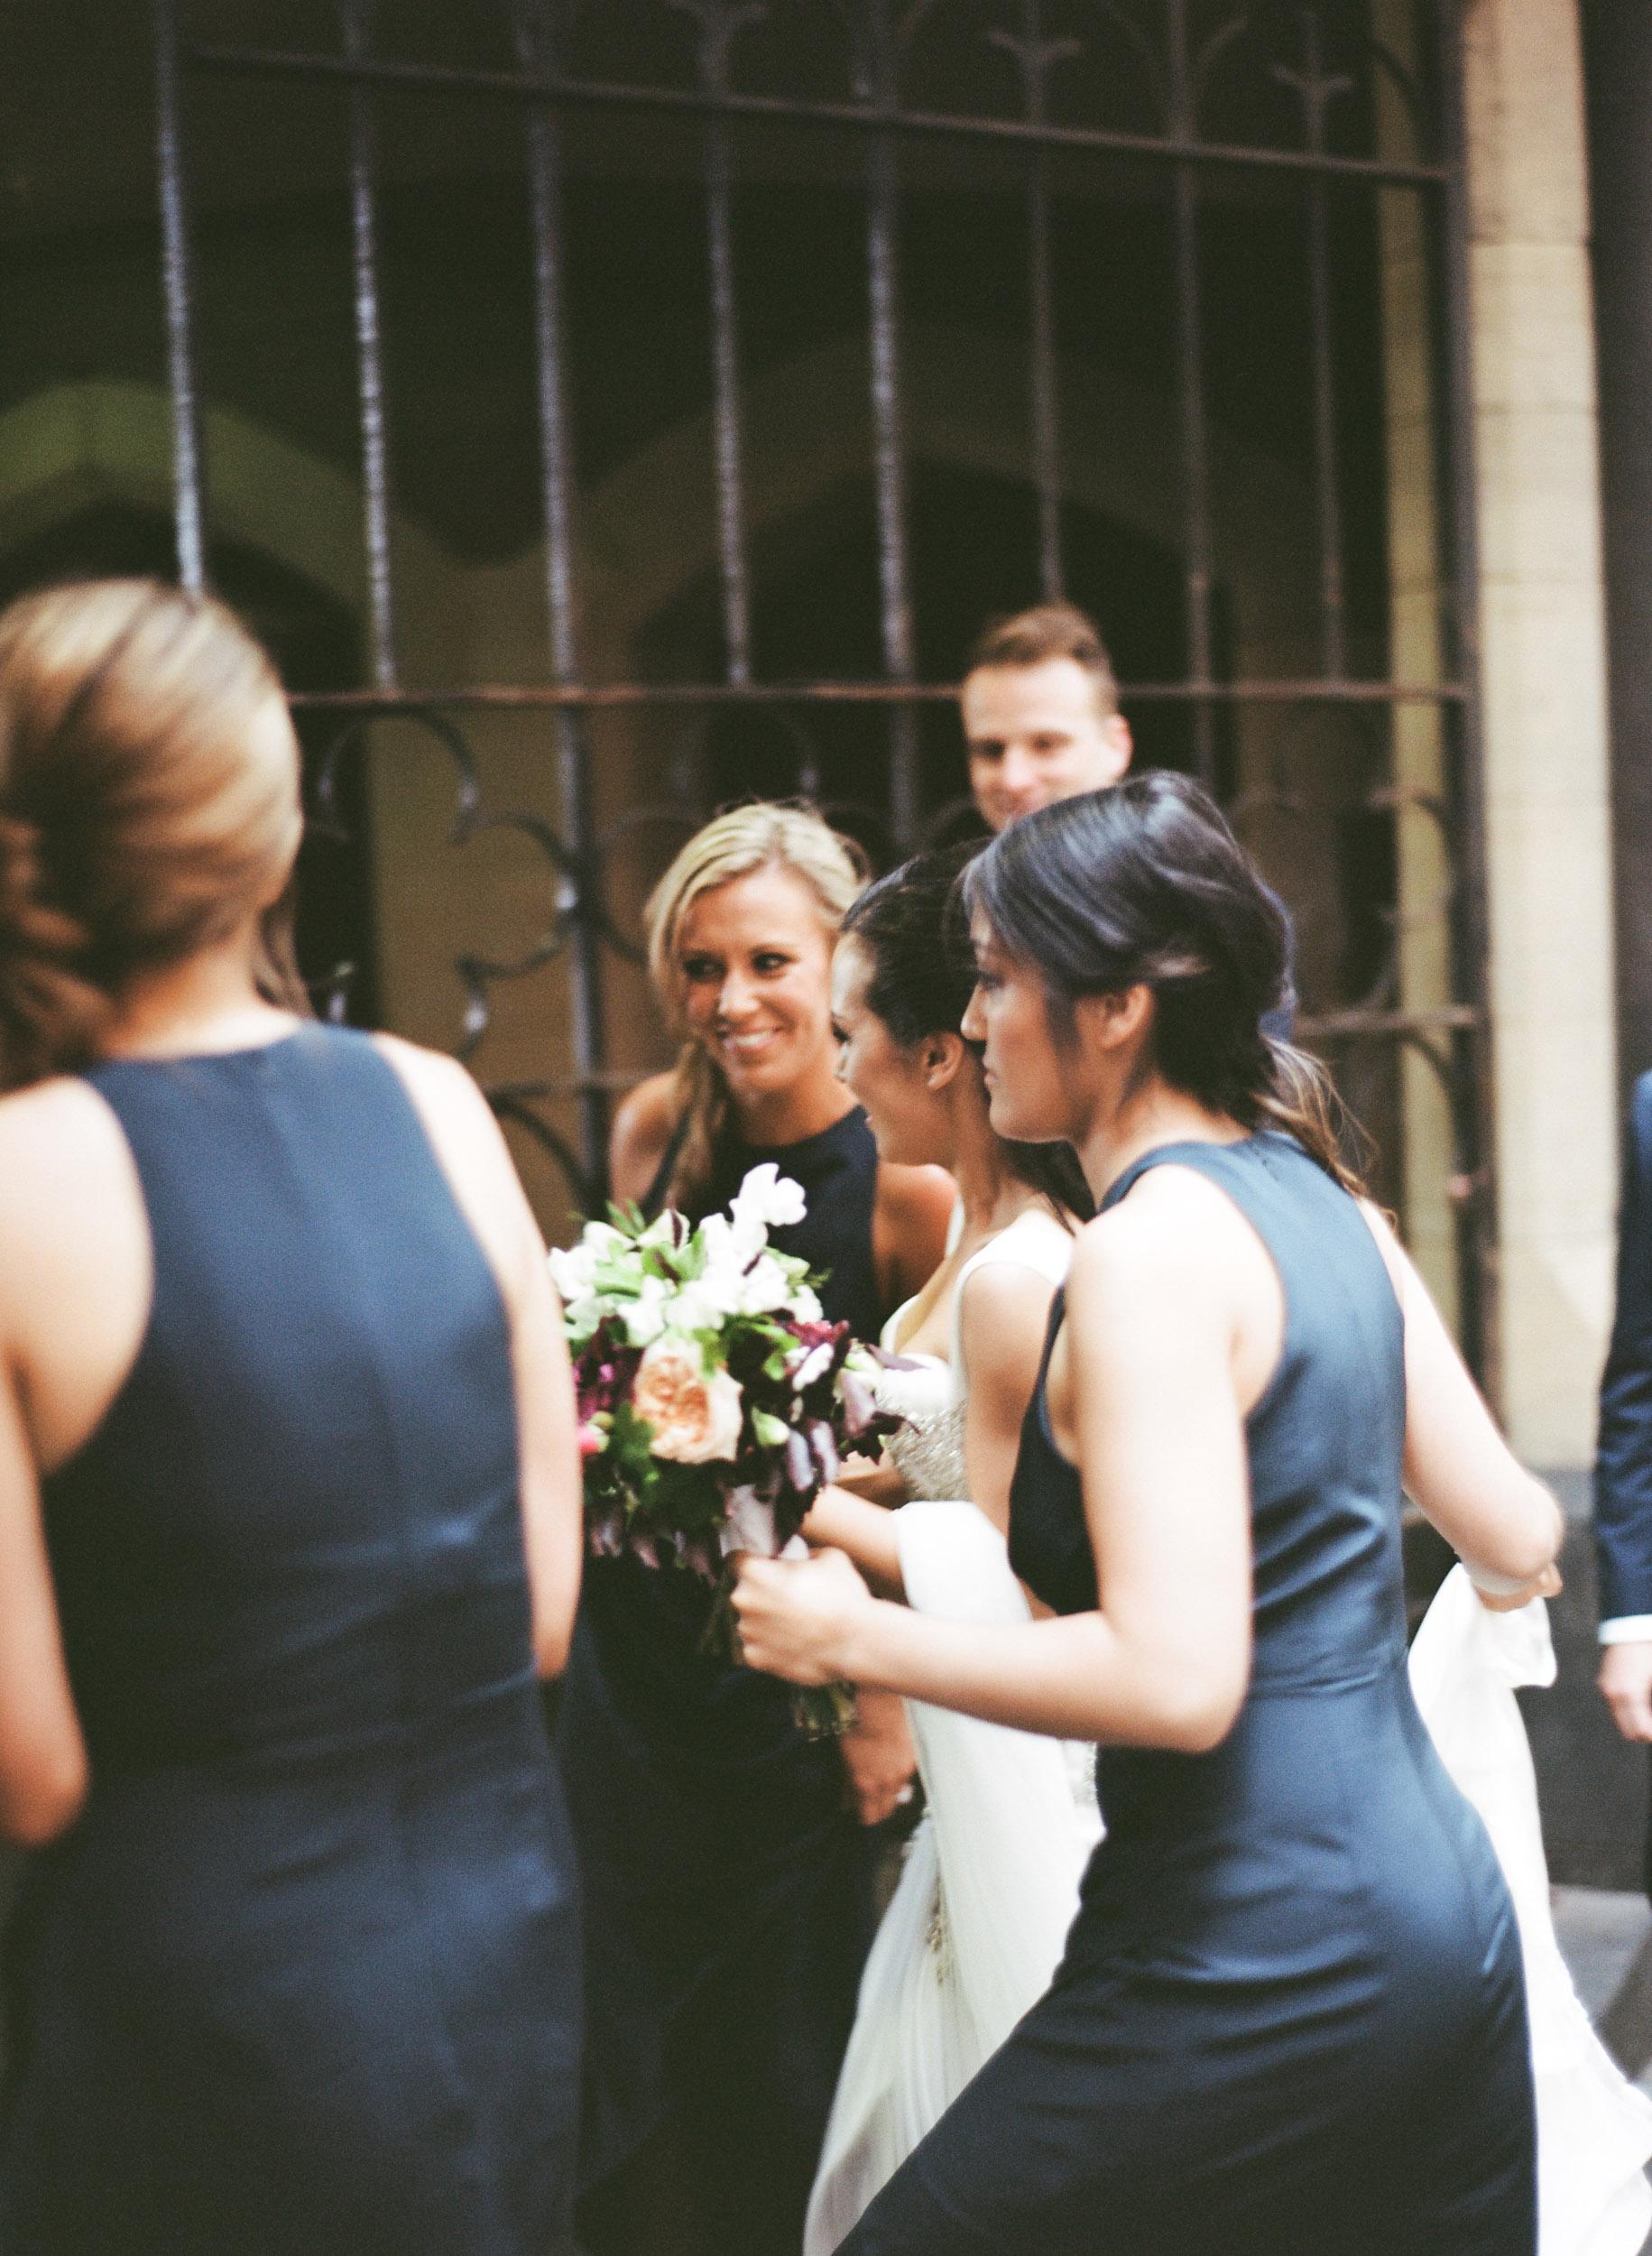 Wedding (2 of 3) - 000020580003.jpg